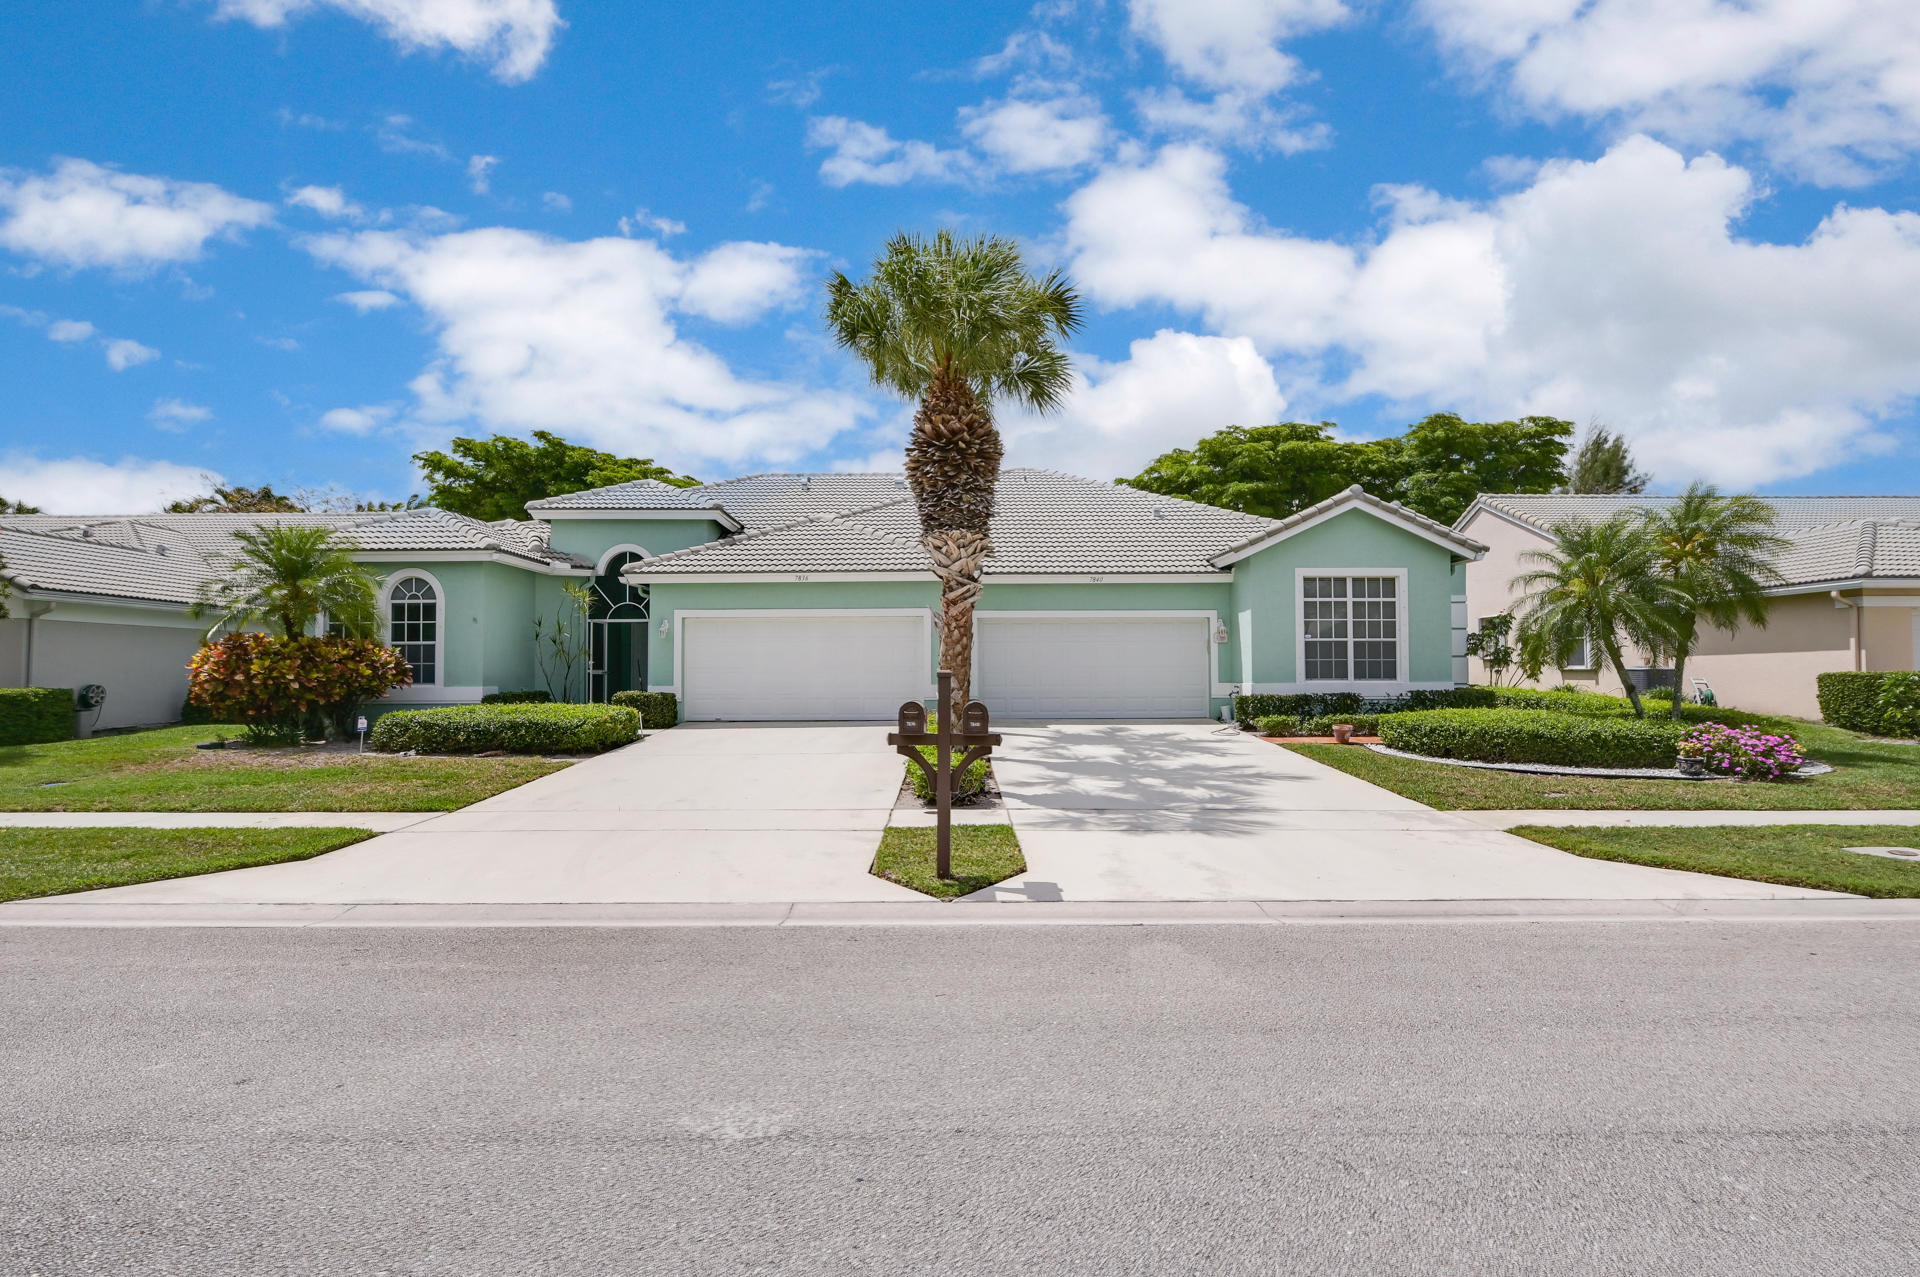 7836  Rockford Road  For Sale 10712249, FL